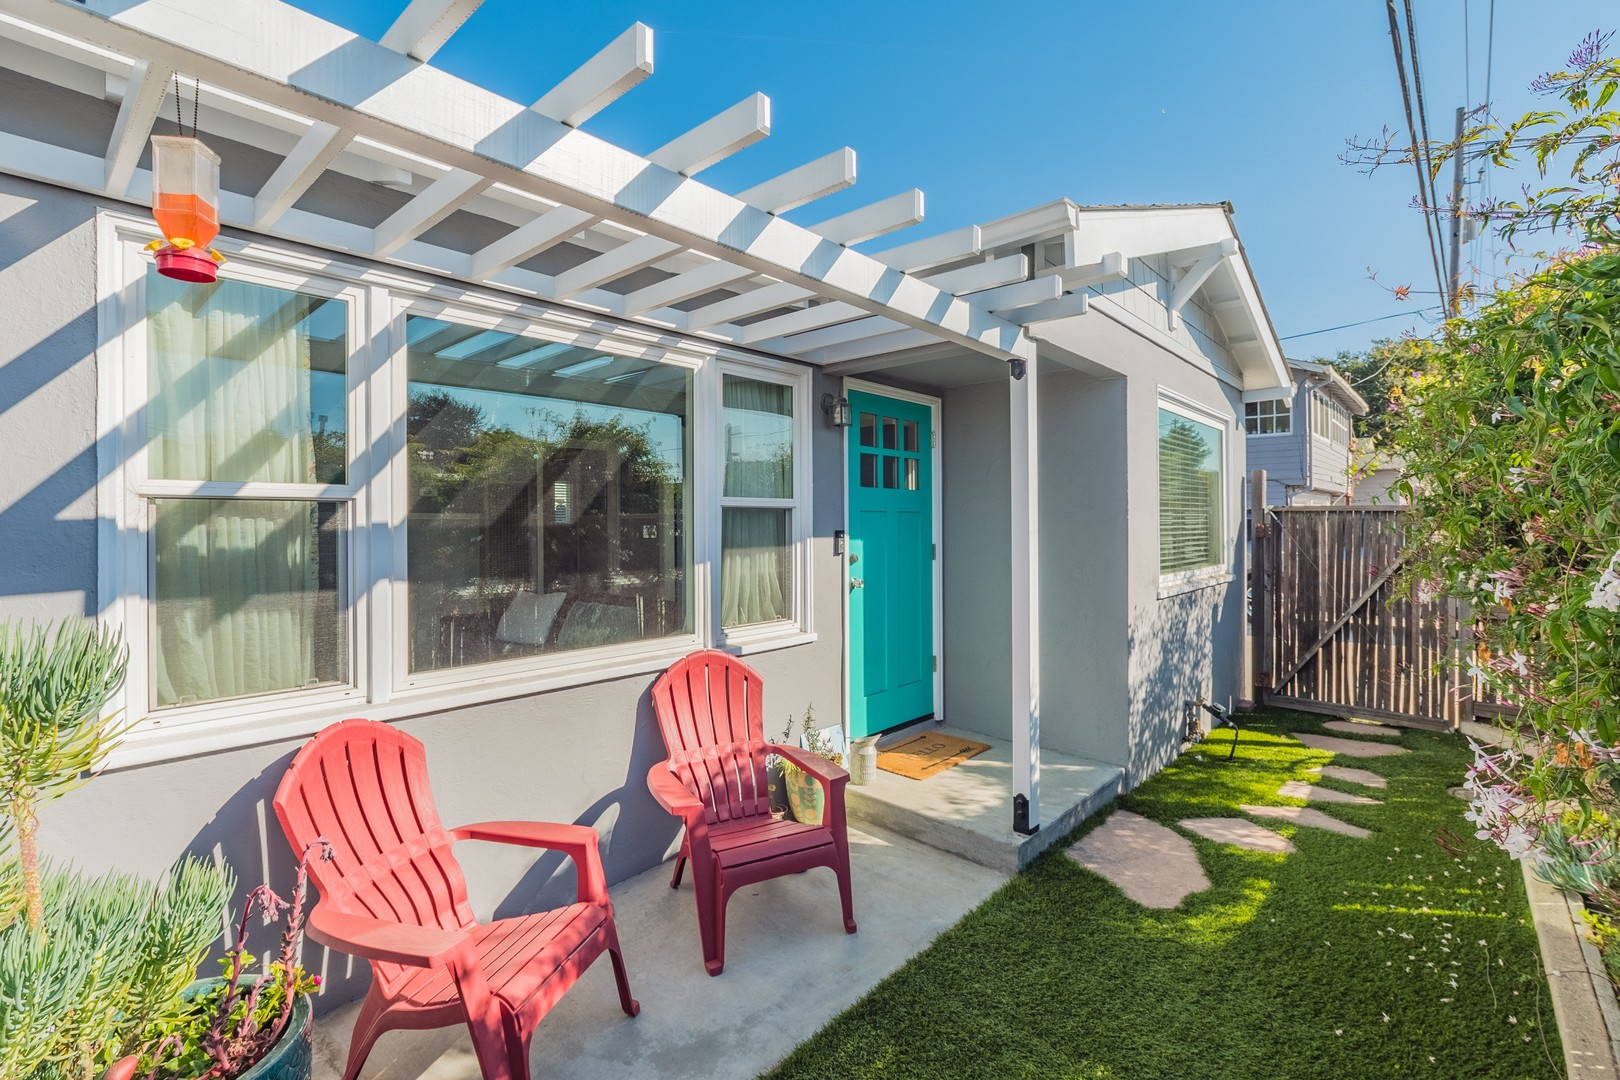 501 Eaton Street, Santa Cruz - 3 Bedroom | 2 Bathroom | 1,008 Sq. Ft.